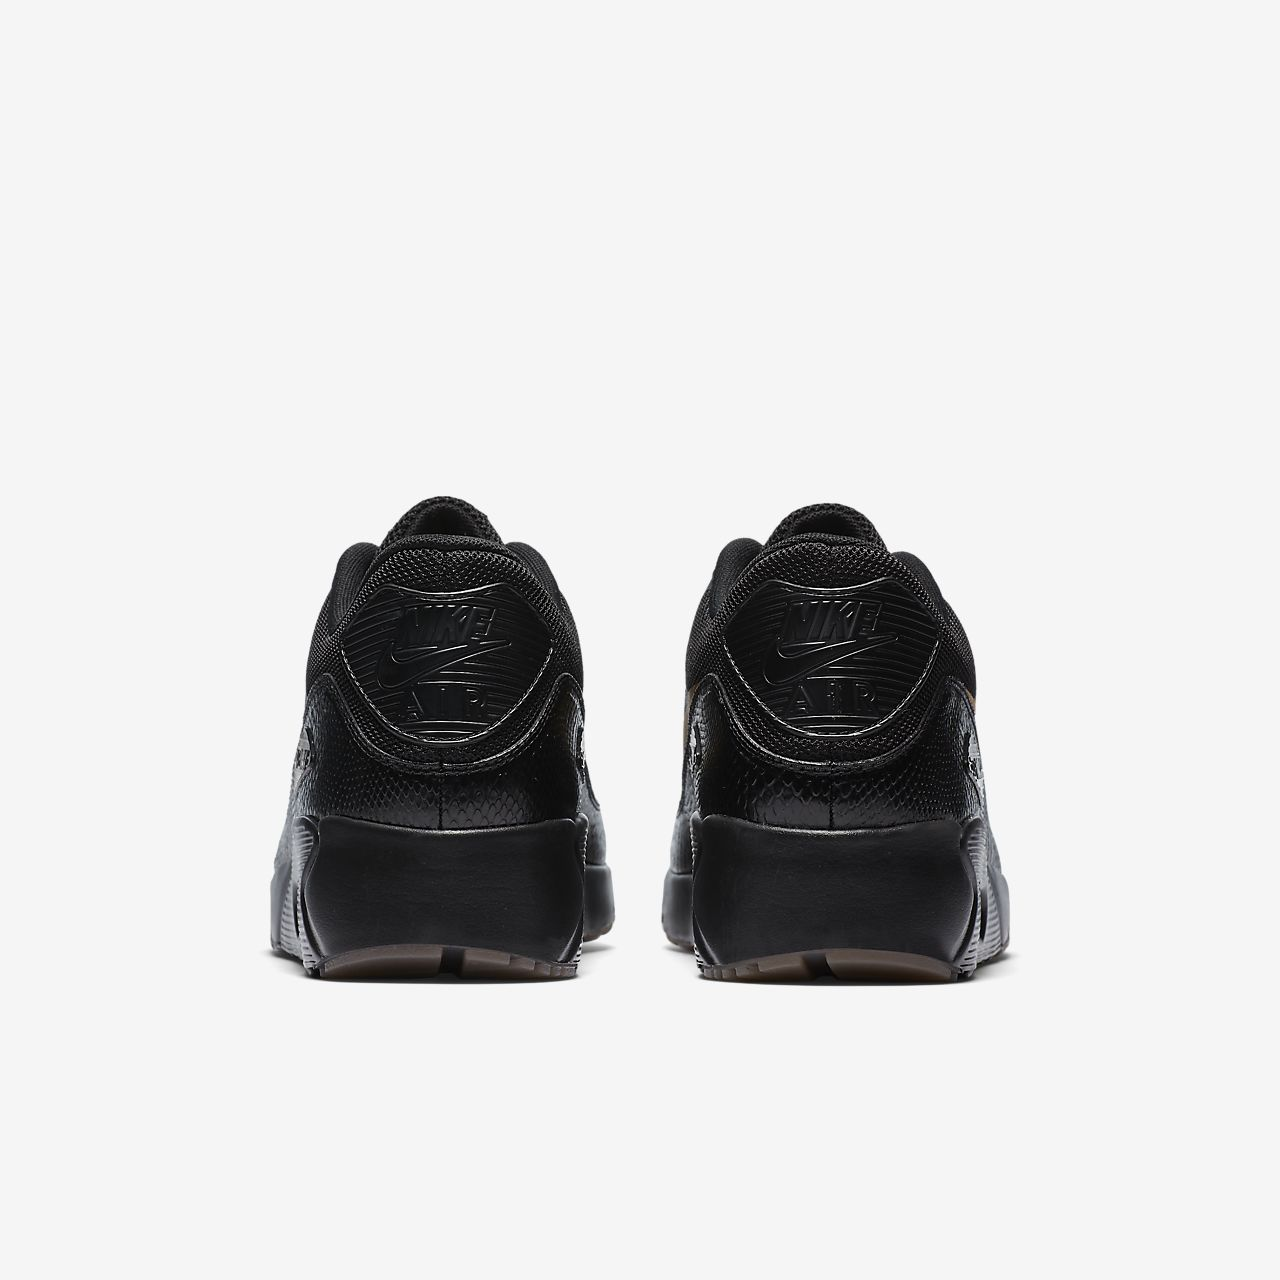 new style a40ec aef6b ... nike air max 90 ultra 2.0 essential mens shoe  nike air max 90 ultra  2.0 essential mens shoe  nike lebron soldier 11 sfg mens lebron james ...